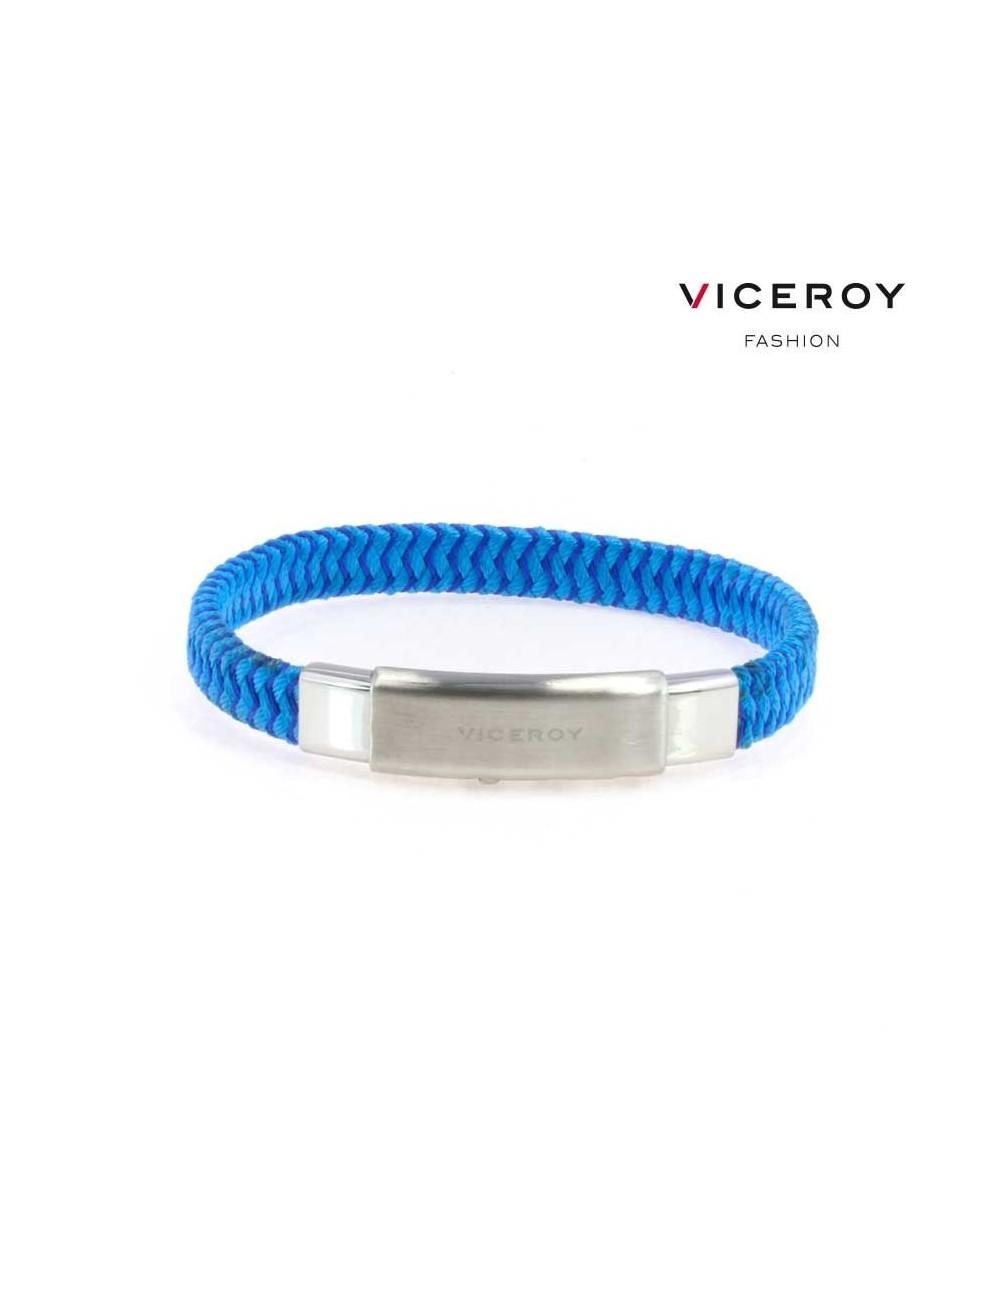 pulsera-viceroy-fashion-poliester-azul-unixex-6431p09013